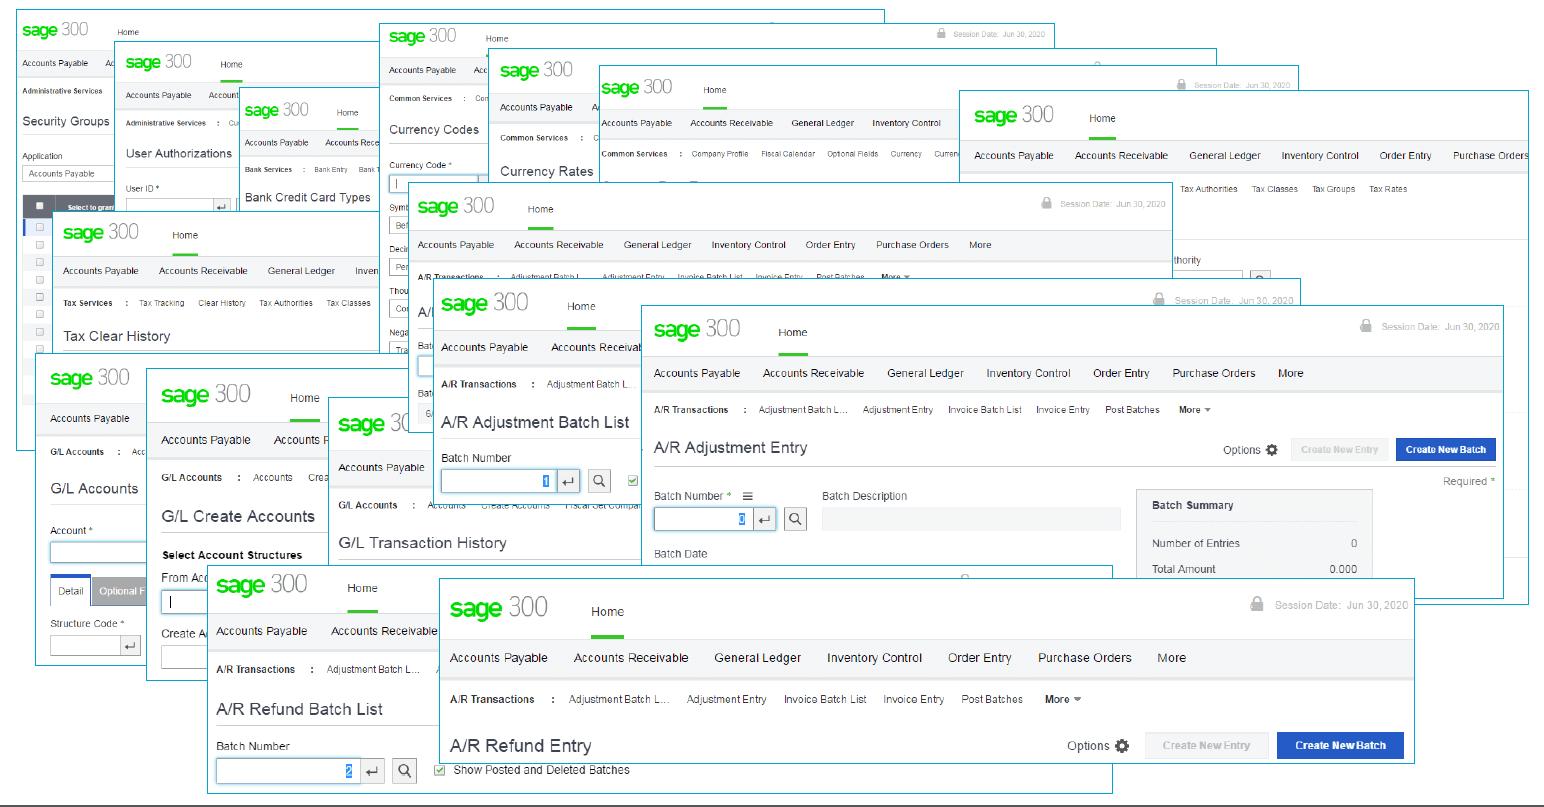 Sage 300 Web Screens